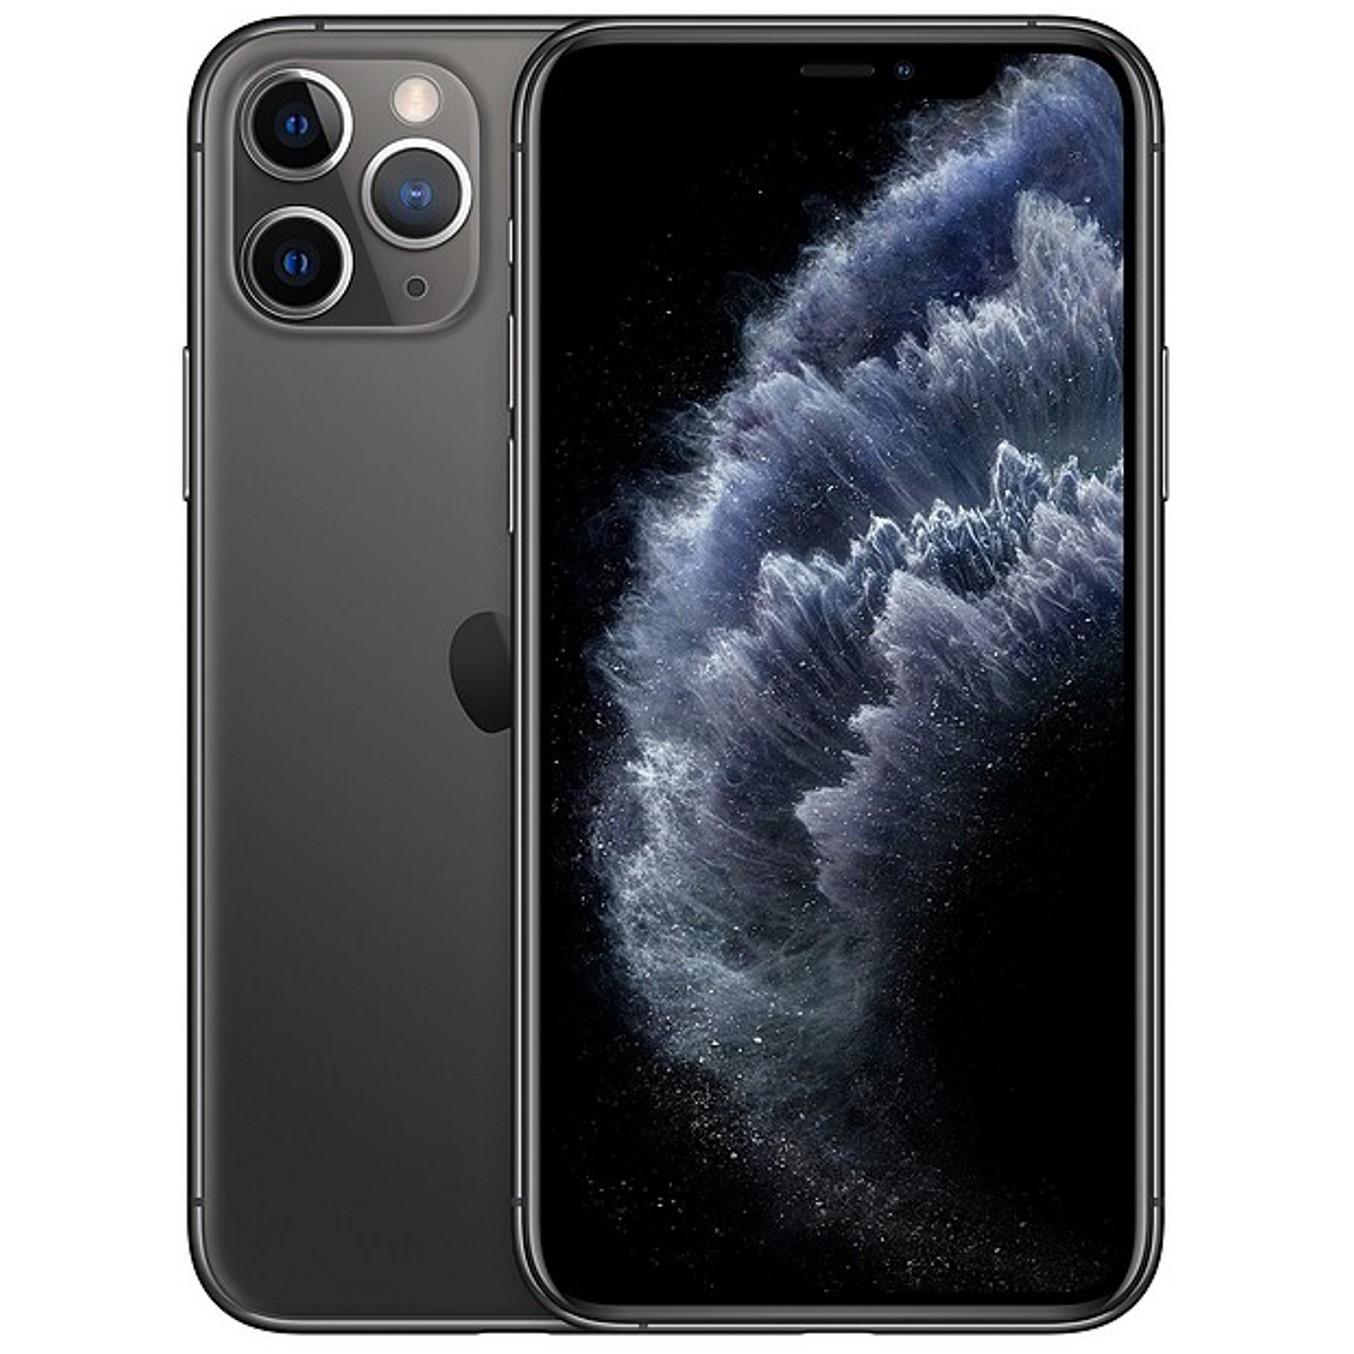 Telefono movil smartphone apple iphone 11 pro 64gb space grey - 5.8pulgadas - dual sim - triple camara trasera